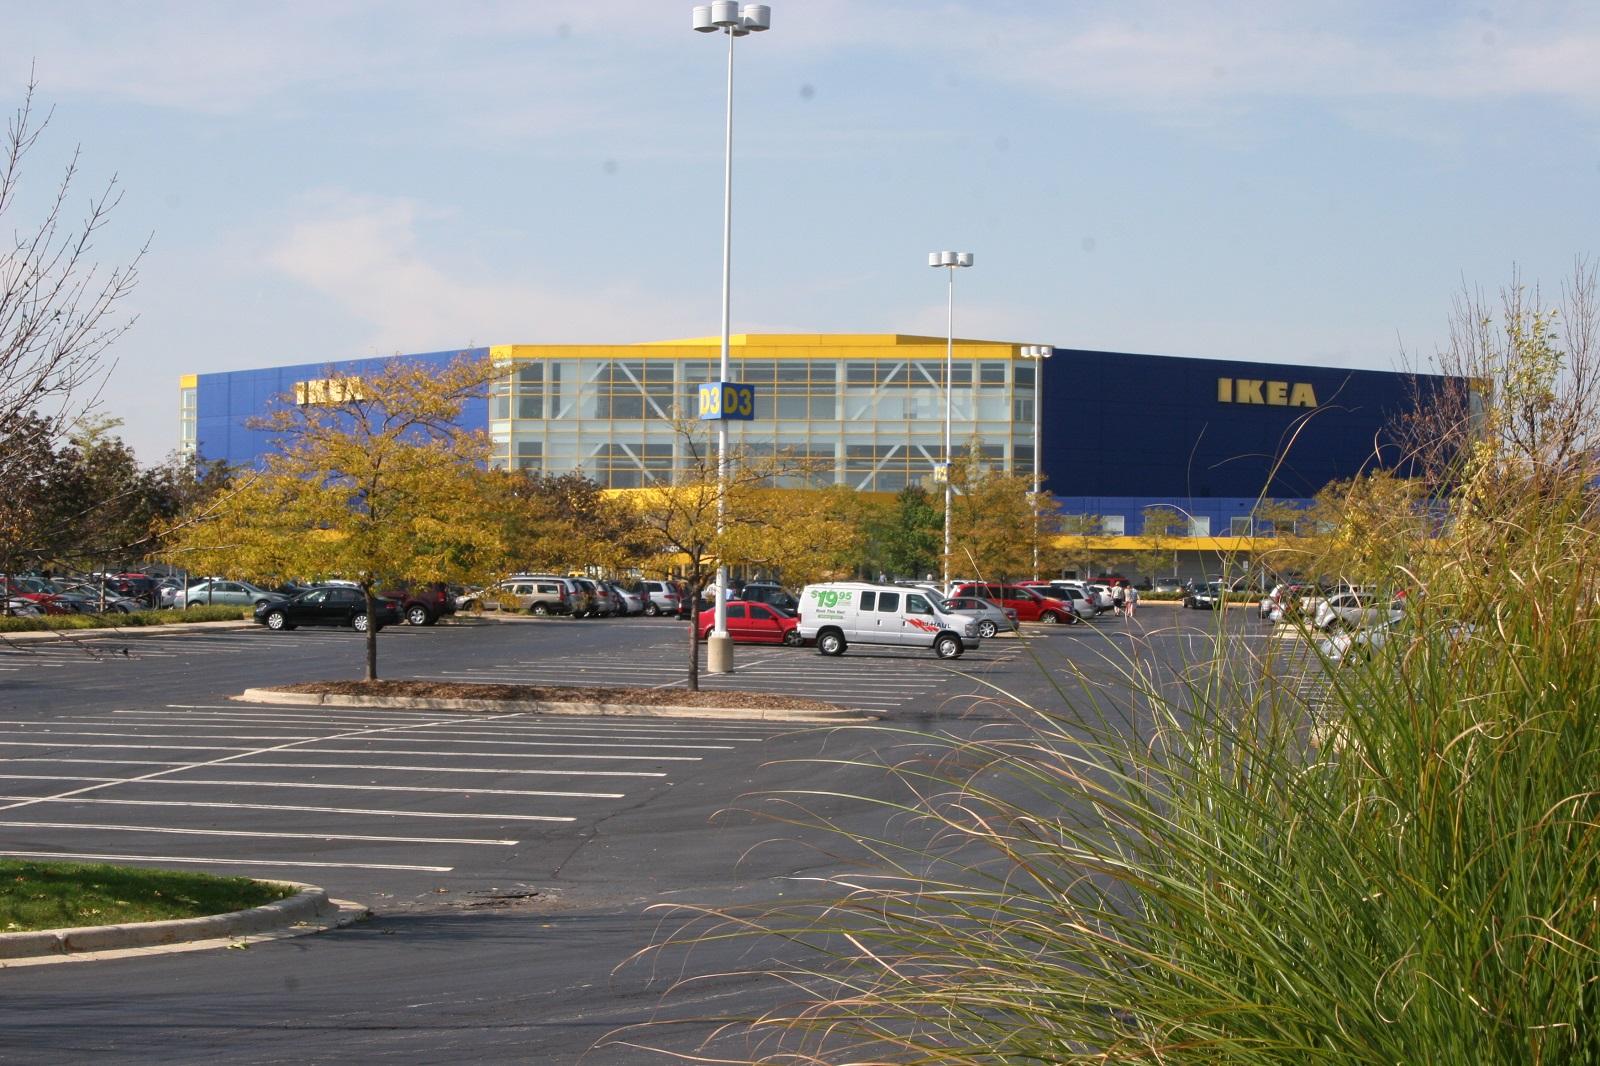 Jacob hefner associates ikea for Ikea call center careers